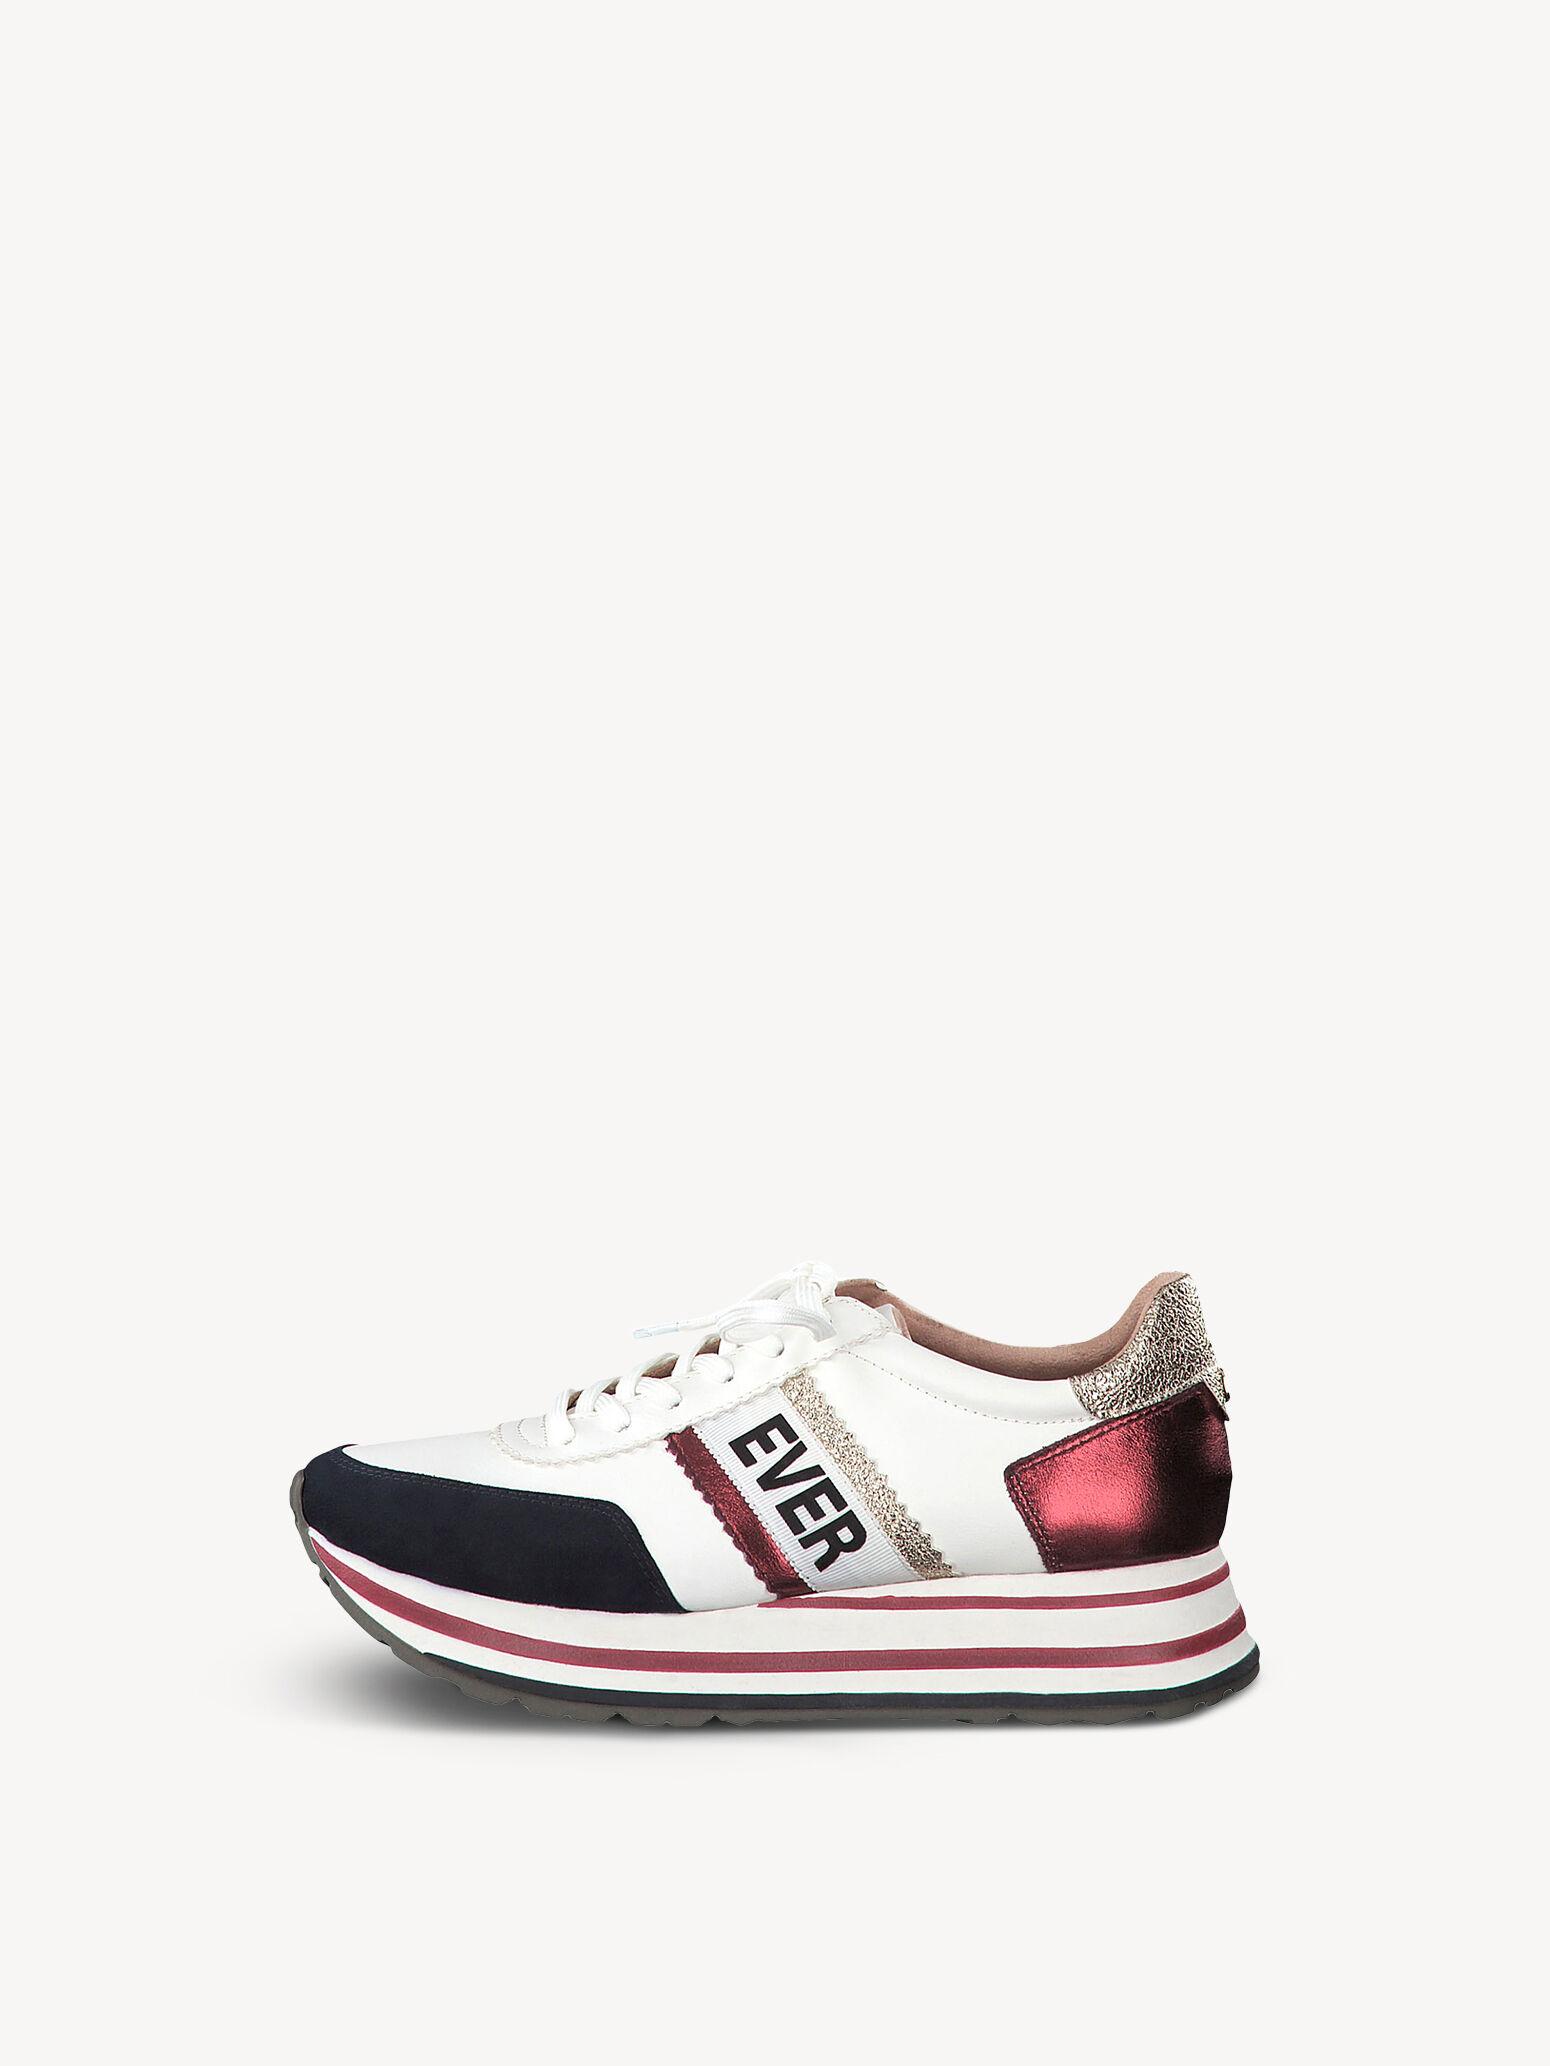 Damen Mädchen Adidas Schuhe Knöchelhoch Hyperlink Gr. 38 23